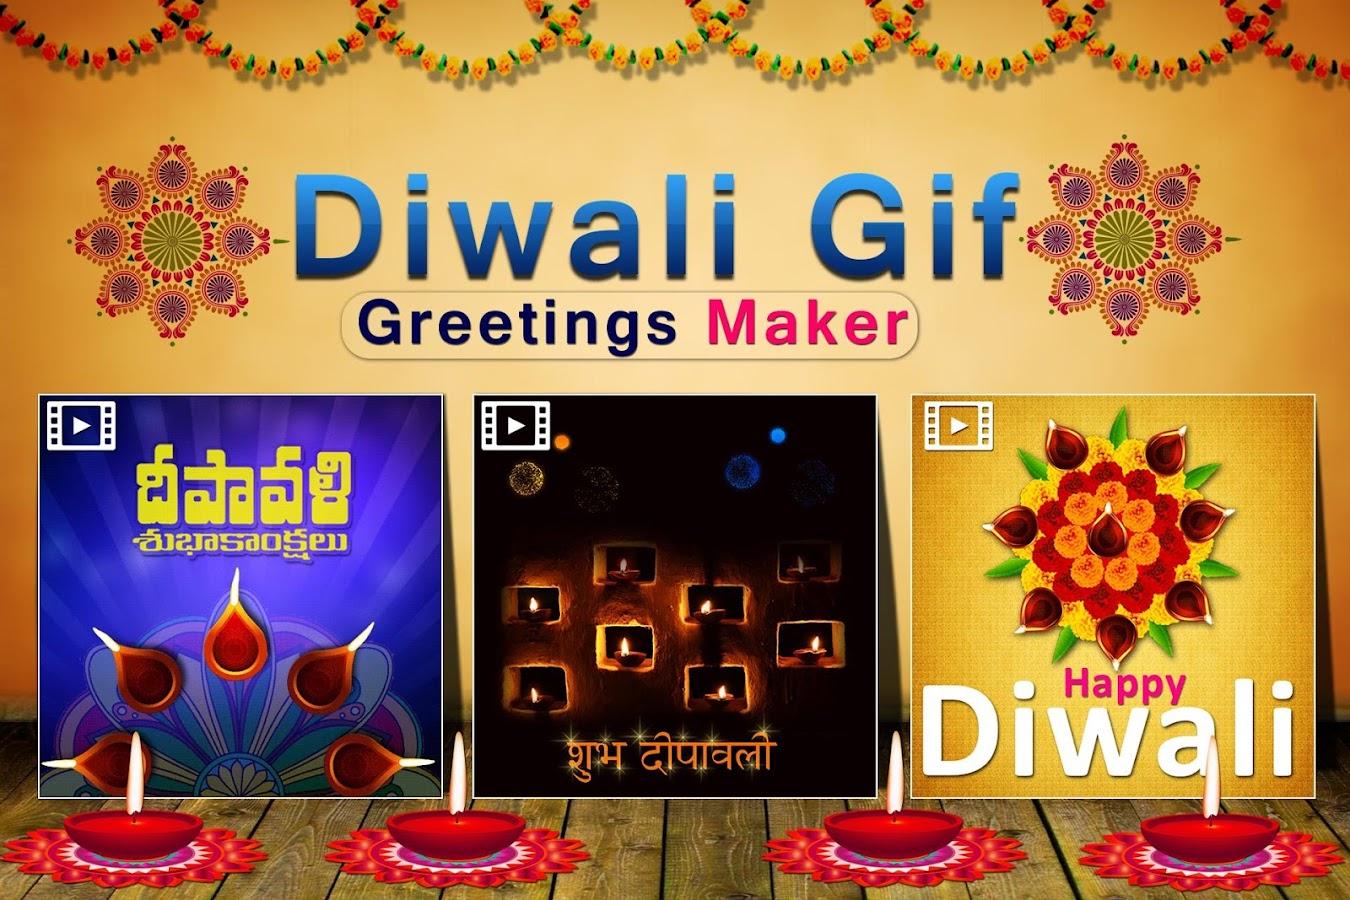 Diwali Gif Greetings Maker 2017 10 Apk Download Android Cats